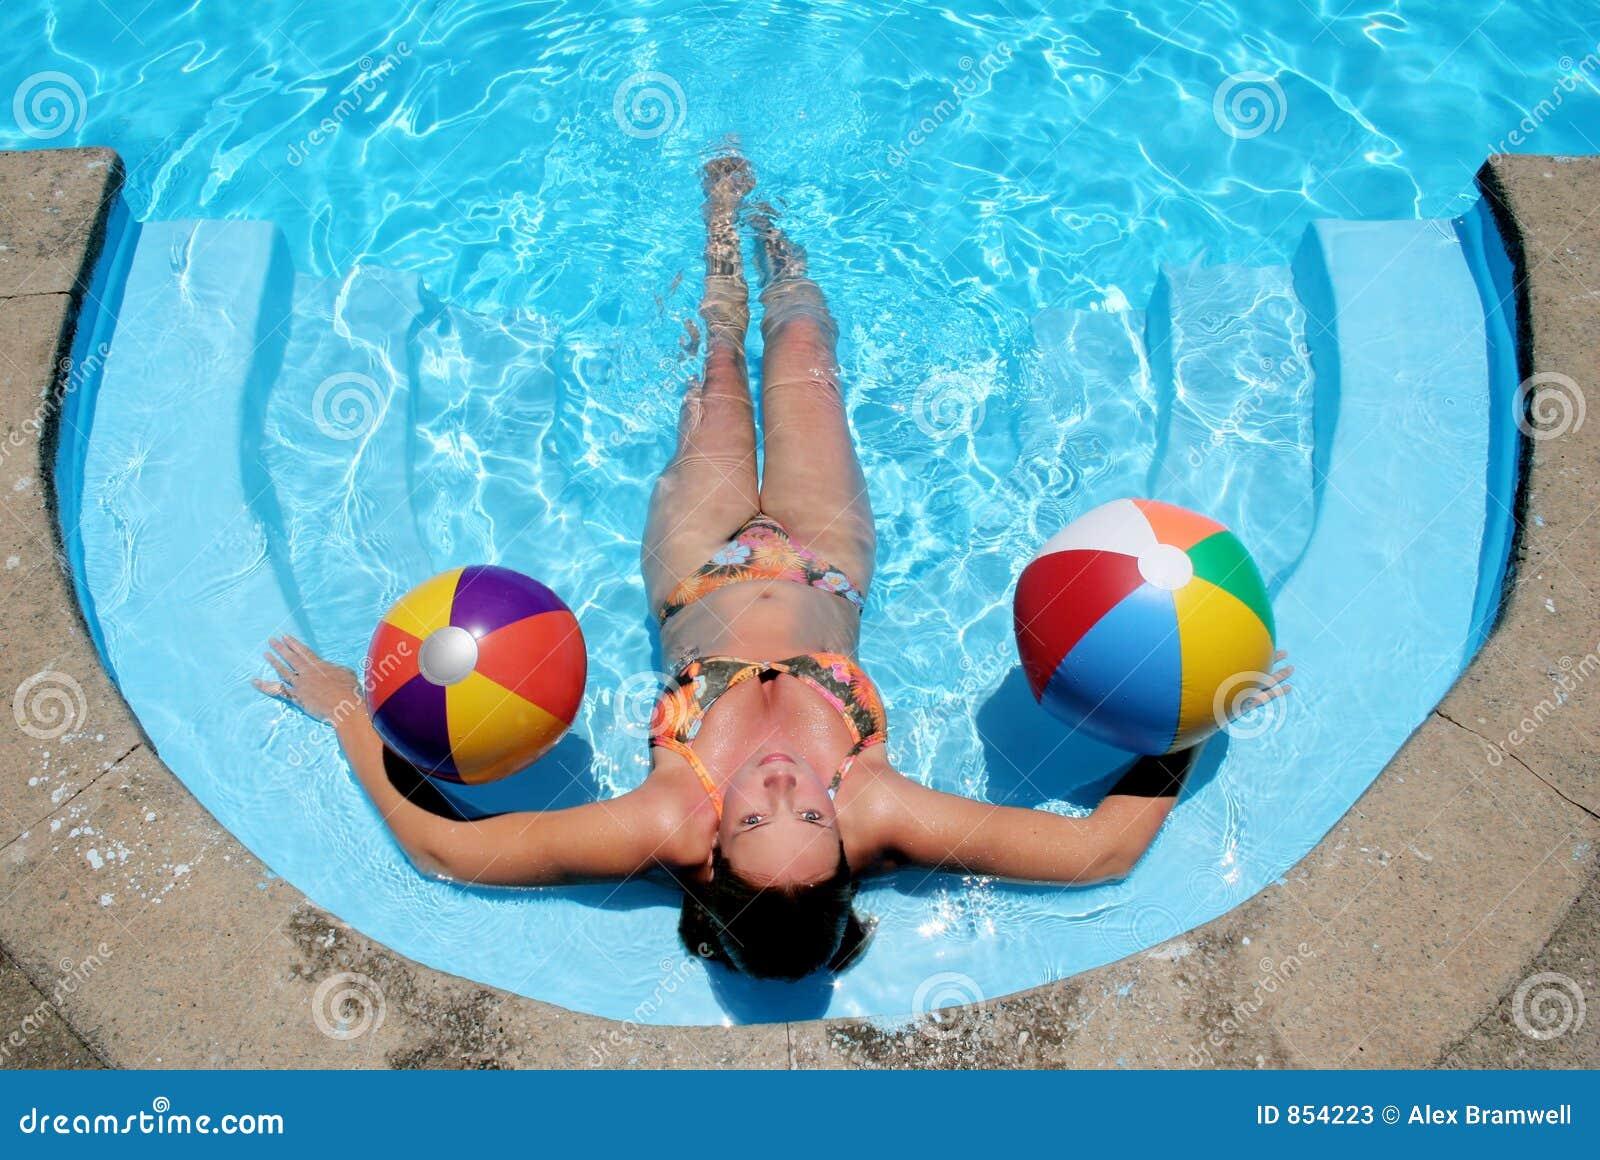 Pool Babes